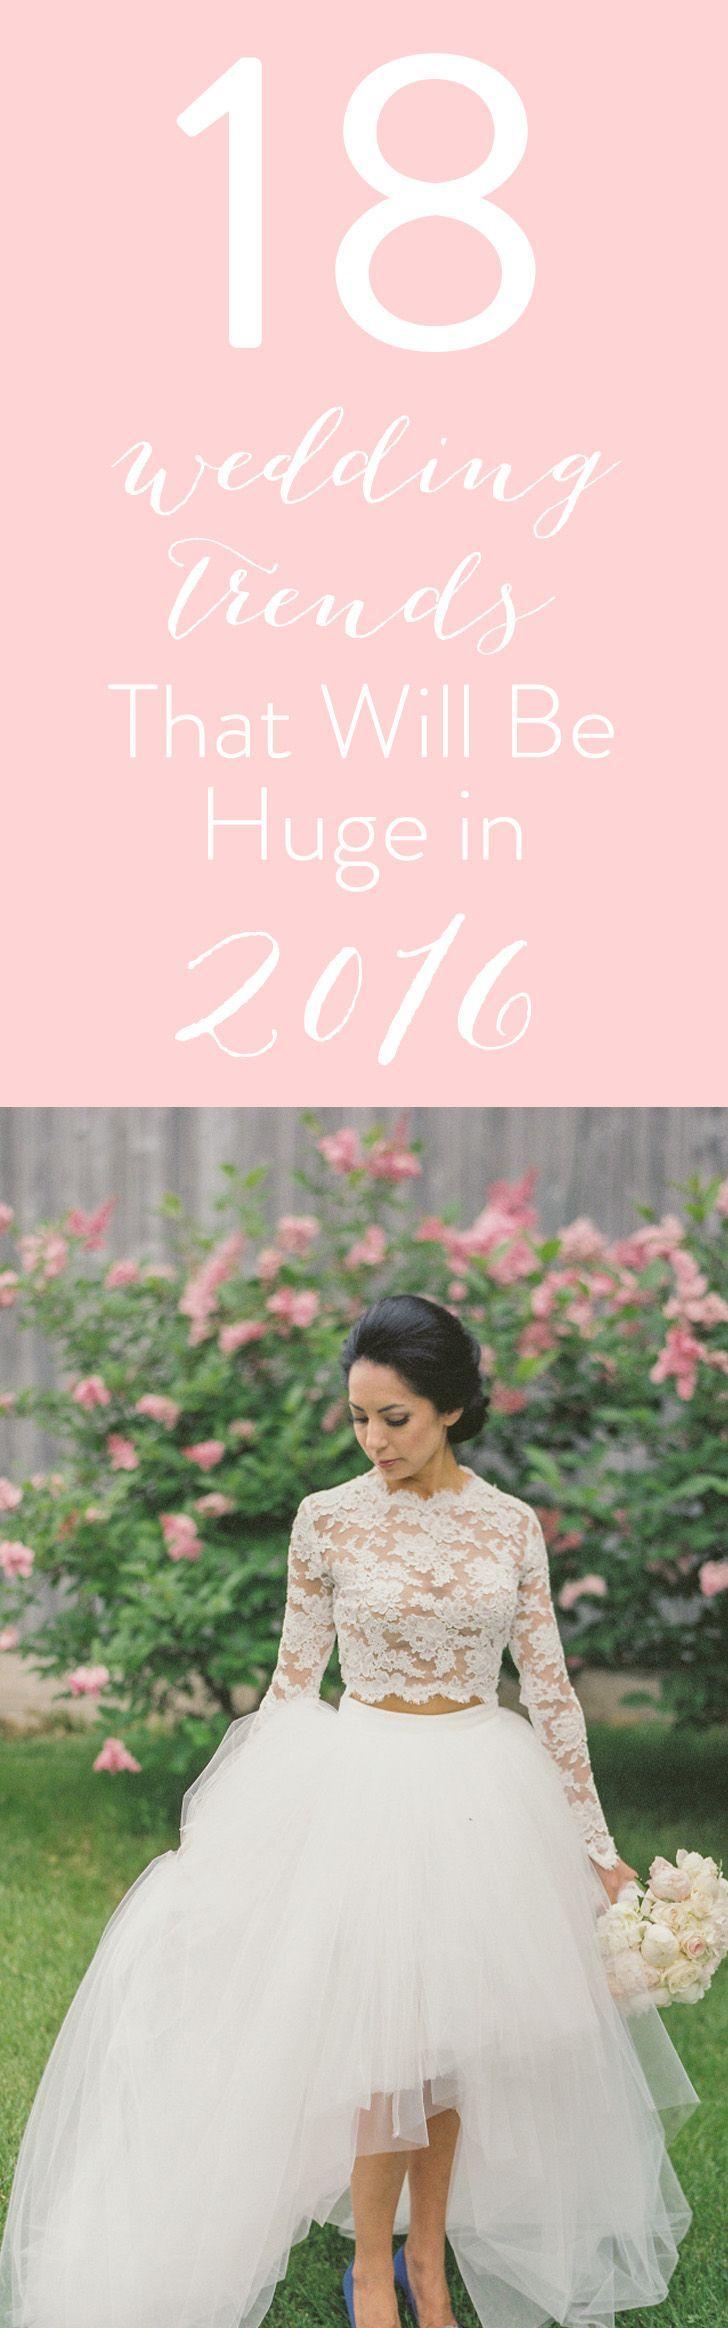 32 best Unconventional Wedding ideas images on Pinterest | Weddings ...